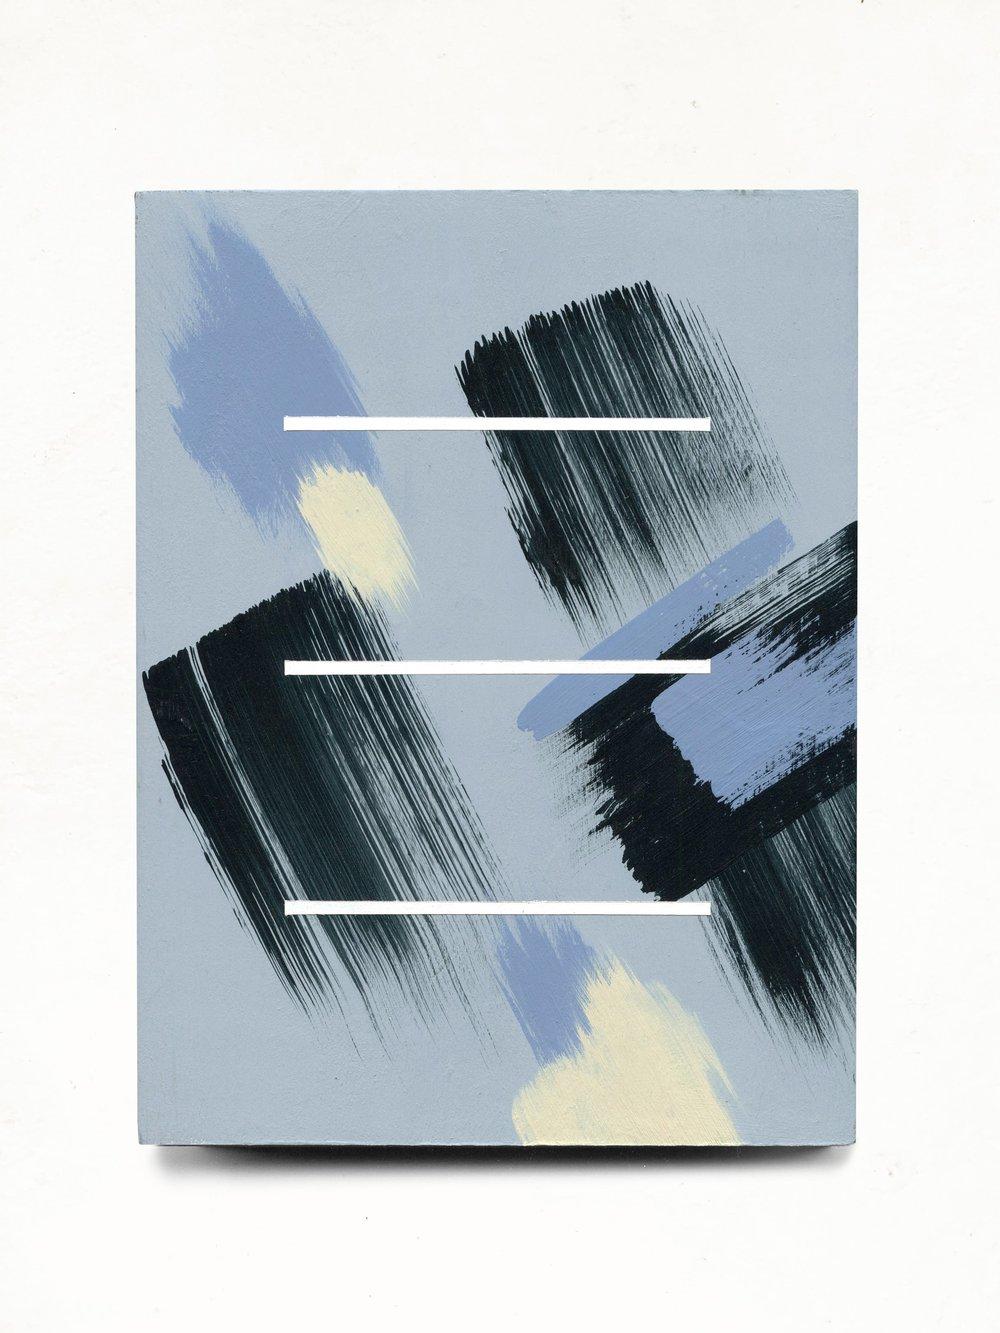 15-brush-comp-blue.jpg